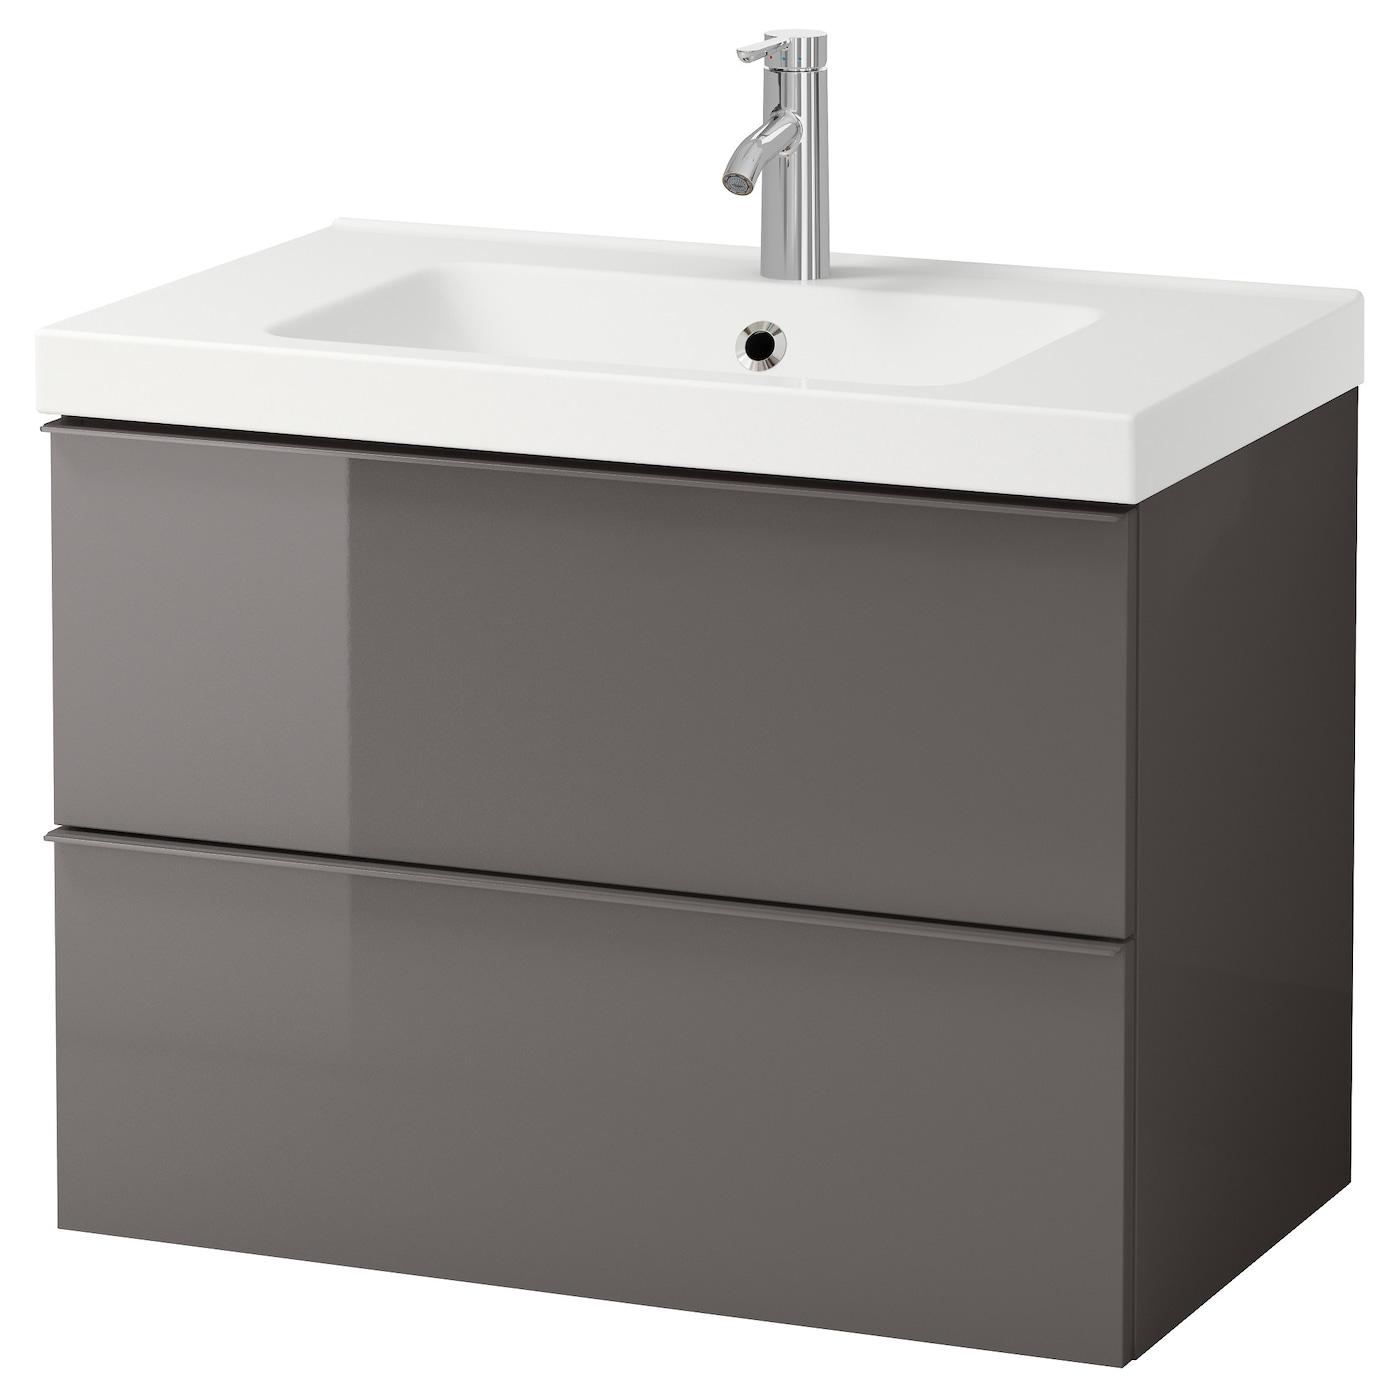 "GODMORGON / ODENSVIK Bathroom vanity - high gloss gray/Dalskär faucet 22  22/22x22 22/22x222 22/22 "" (223x229x622 cm)"